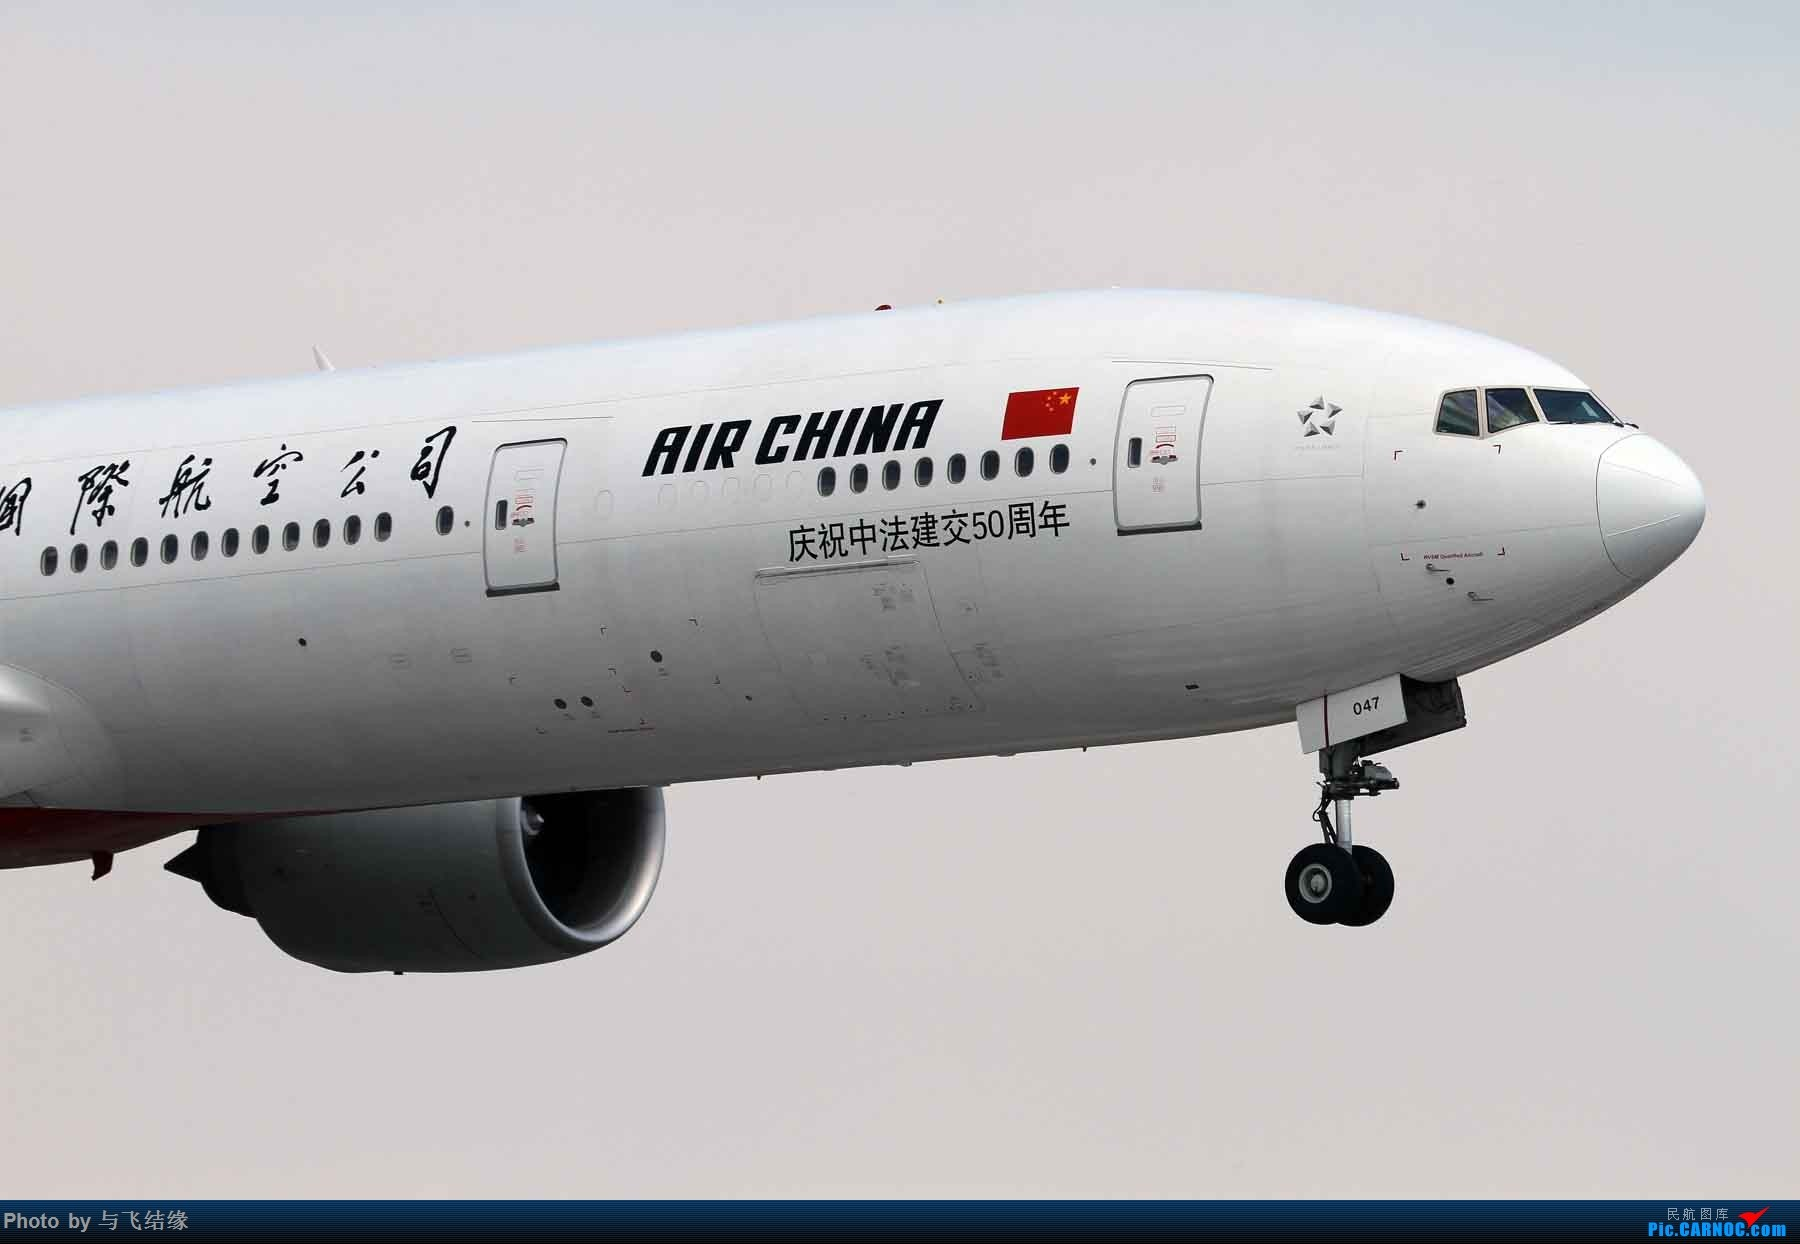 "Re:[原创]灰白色调下的一组""中法建交50年""B-2047Boeing 777-300ER特写照! BOEING 777-300ER B-2047 中国北京首都国际机场"